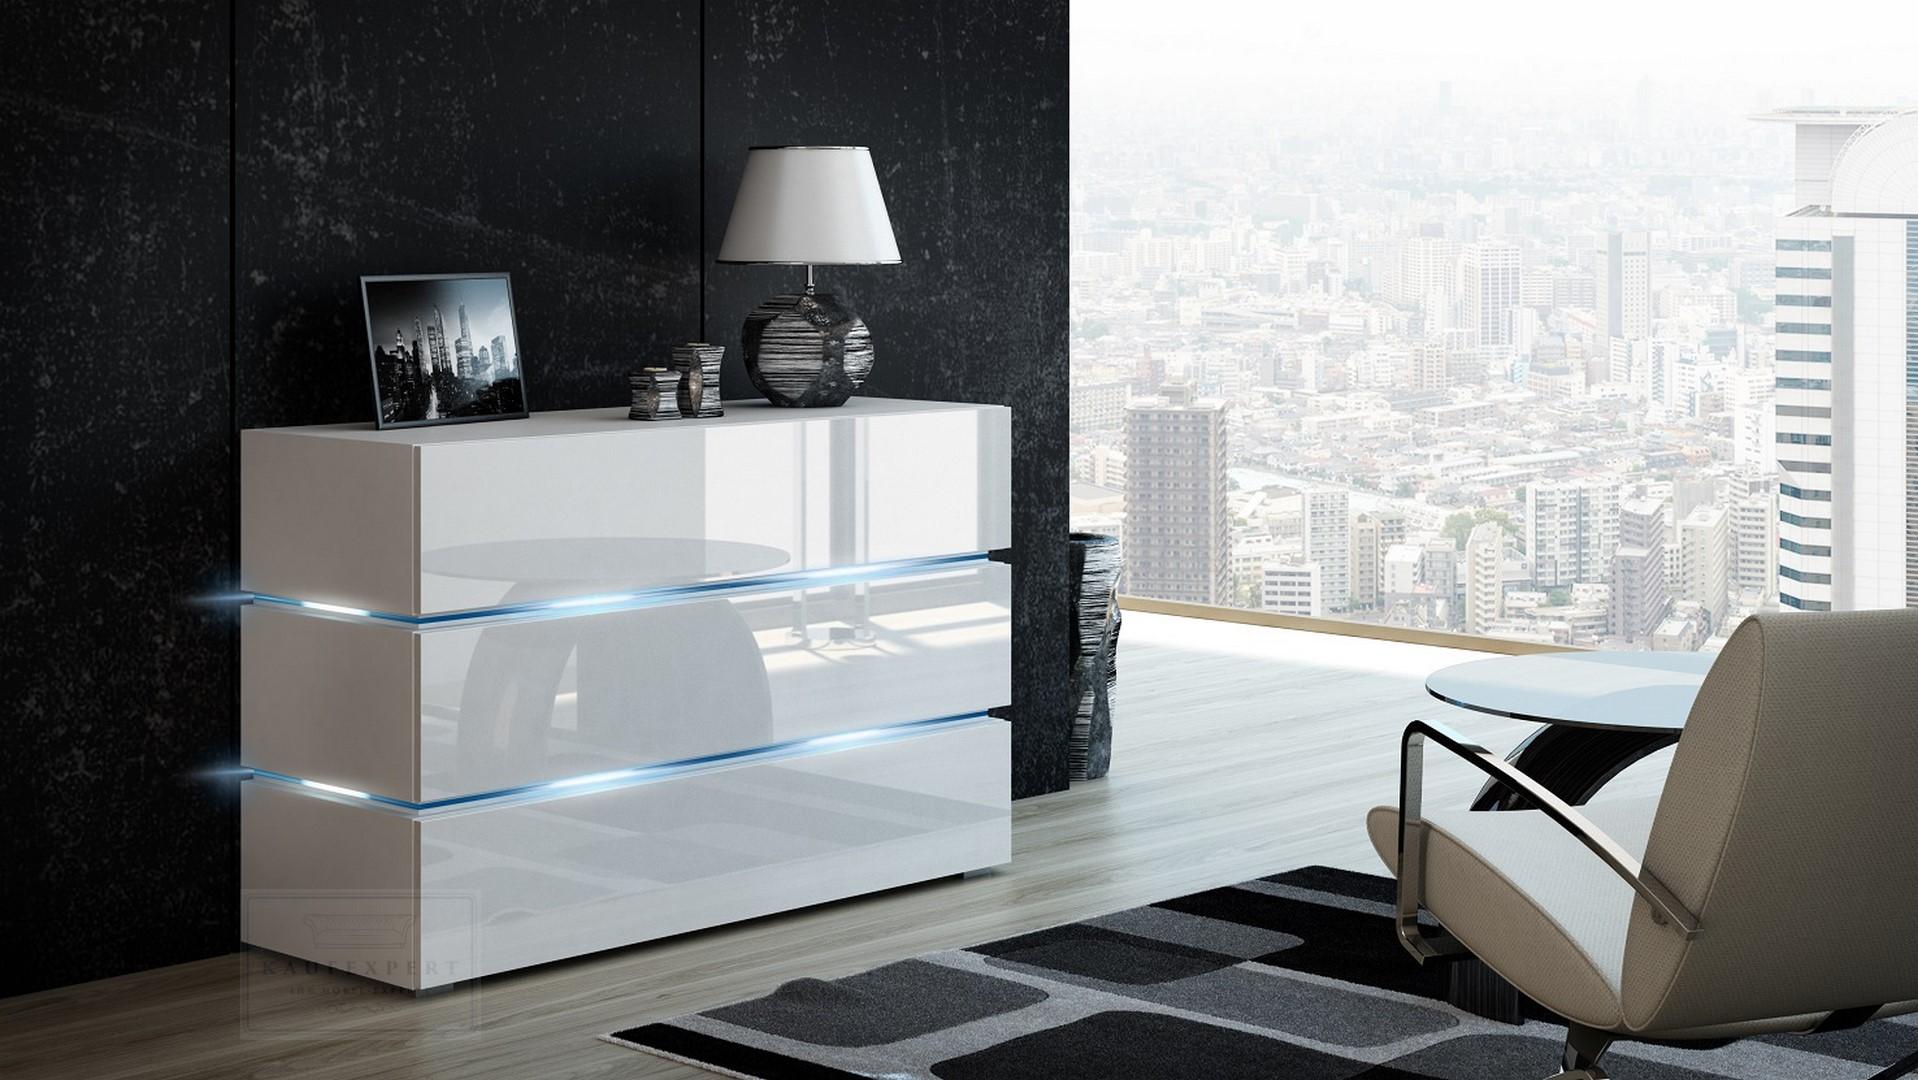 kommode 1m breit perfect medium size of schrank cm tief. Black Bedroom Furniture Sets. Home Design Ideas